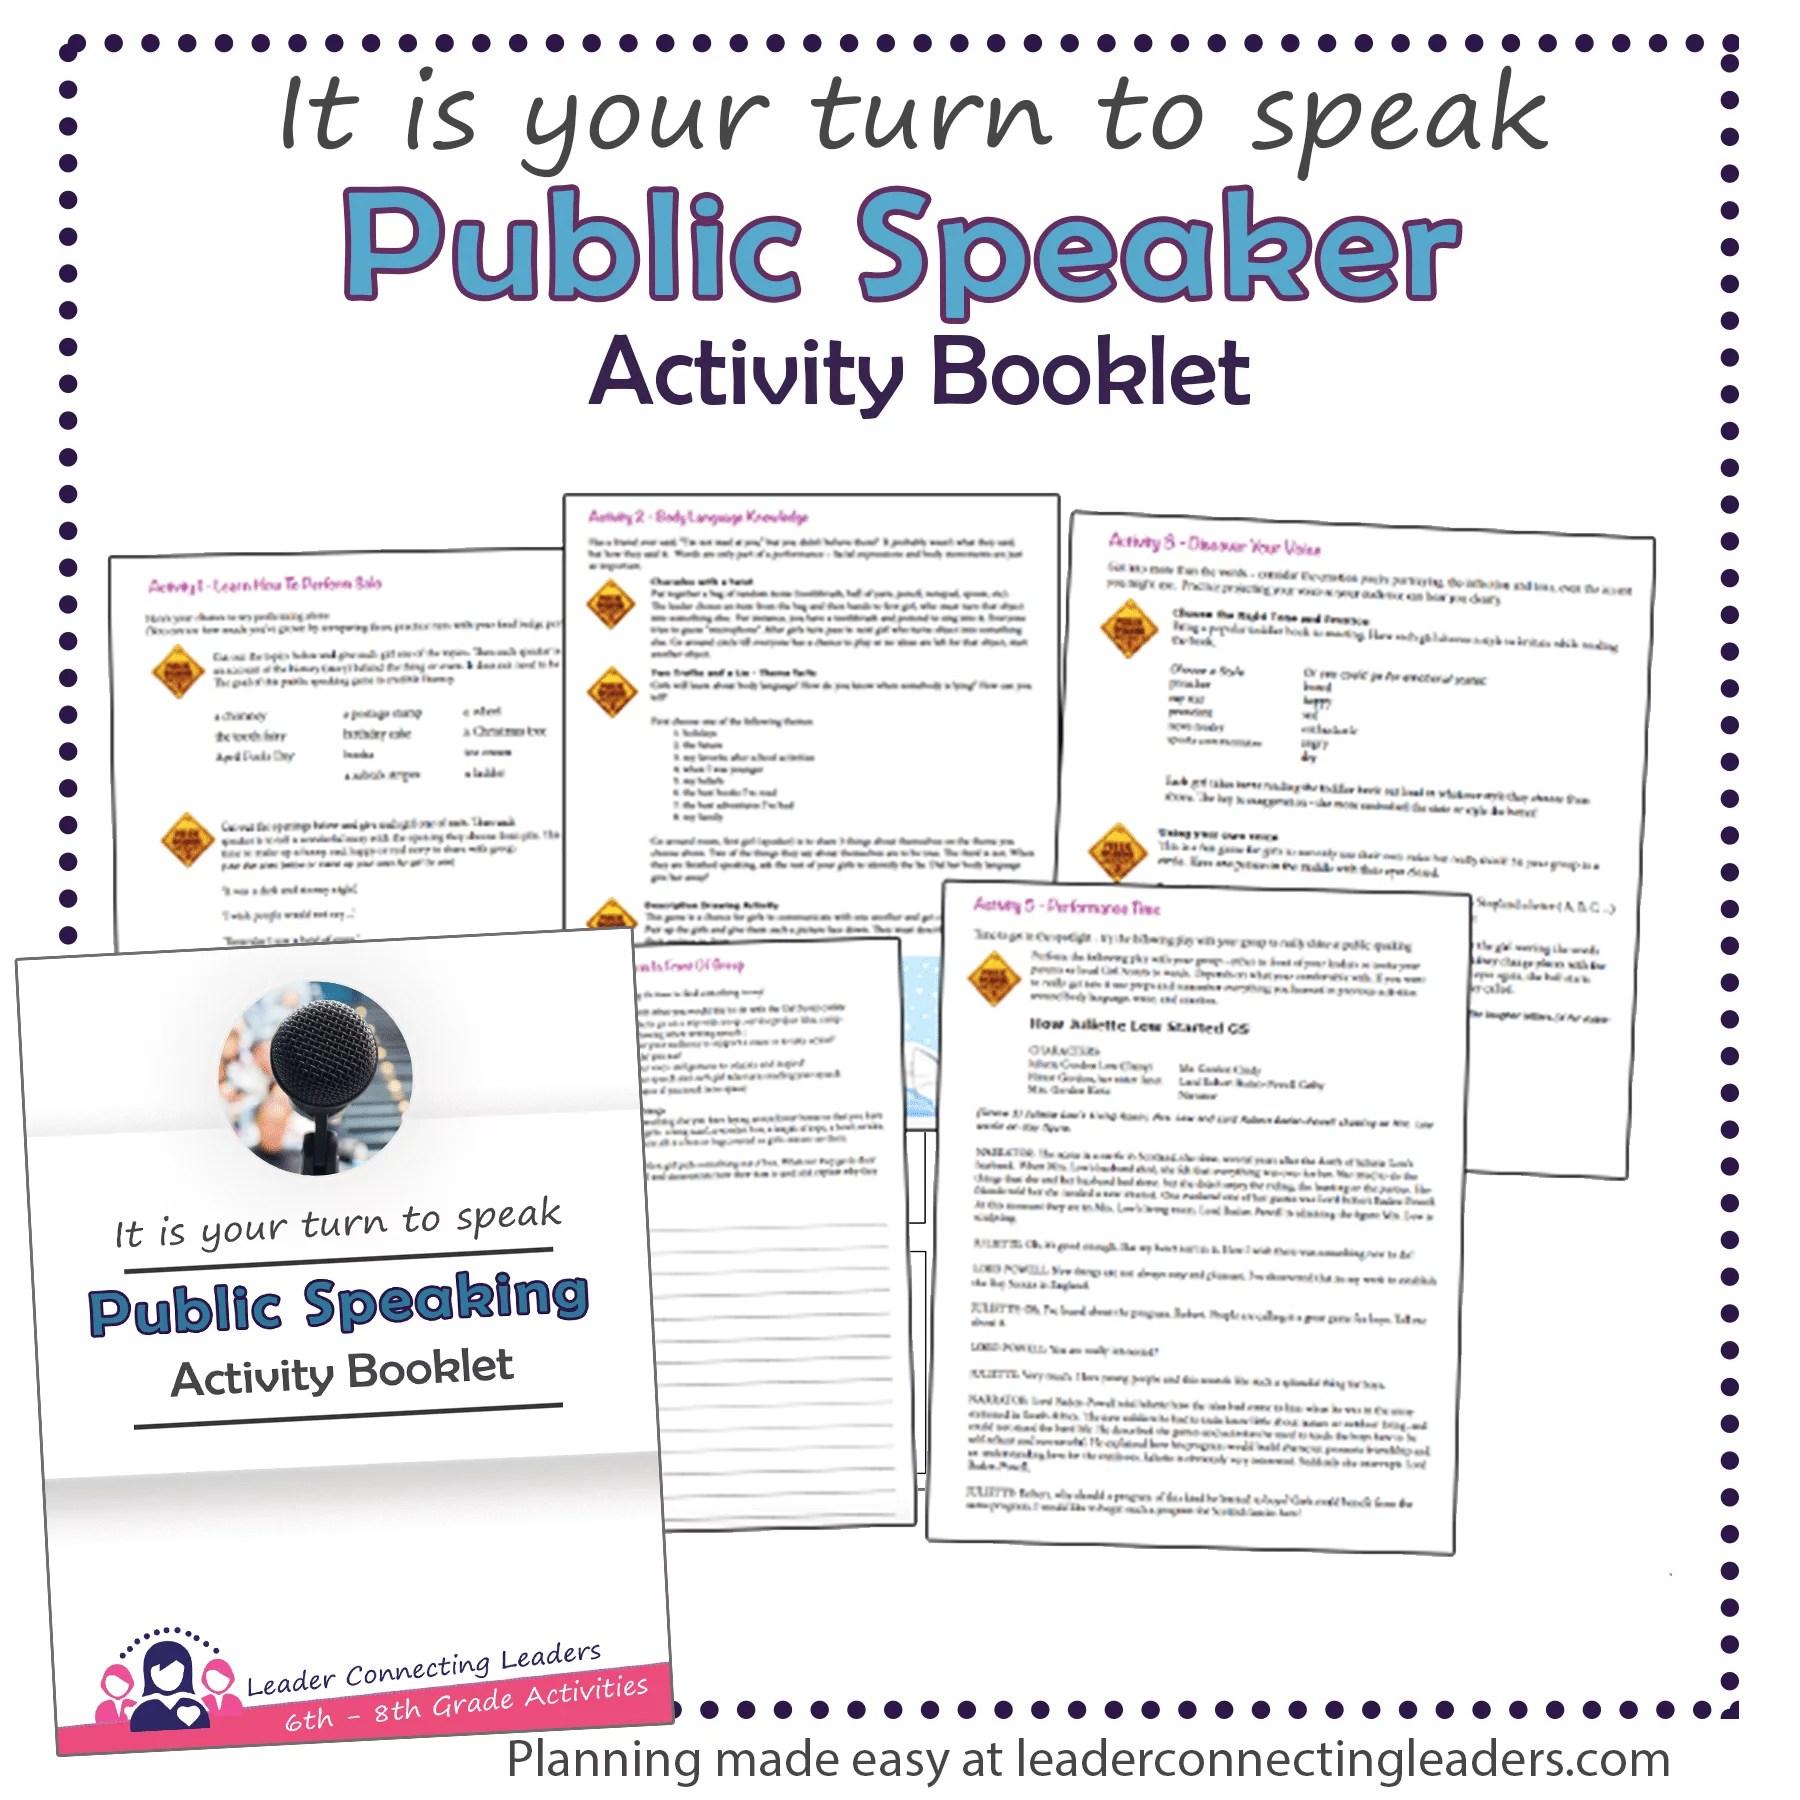 Public Speaker Activity Booklet